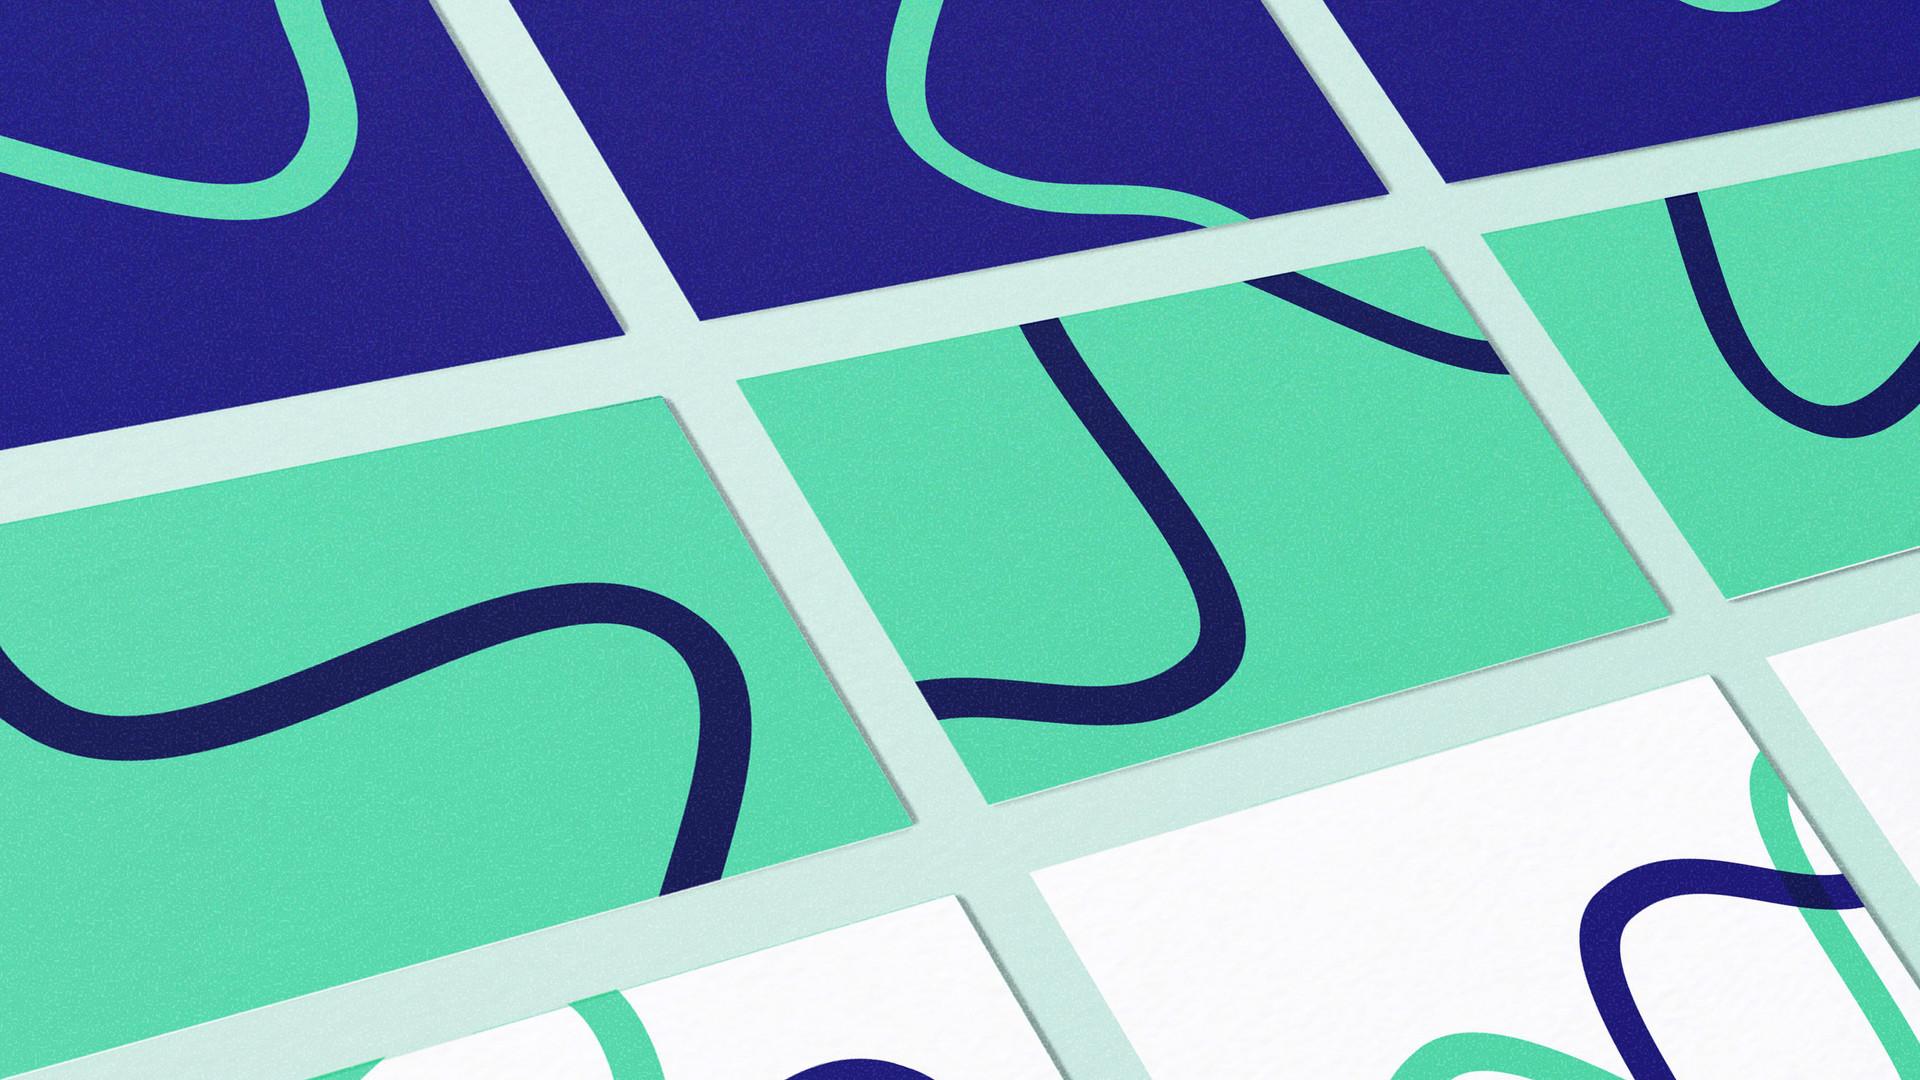 Uniform Business Cards Mockup副本.jpg